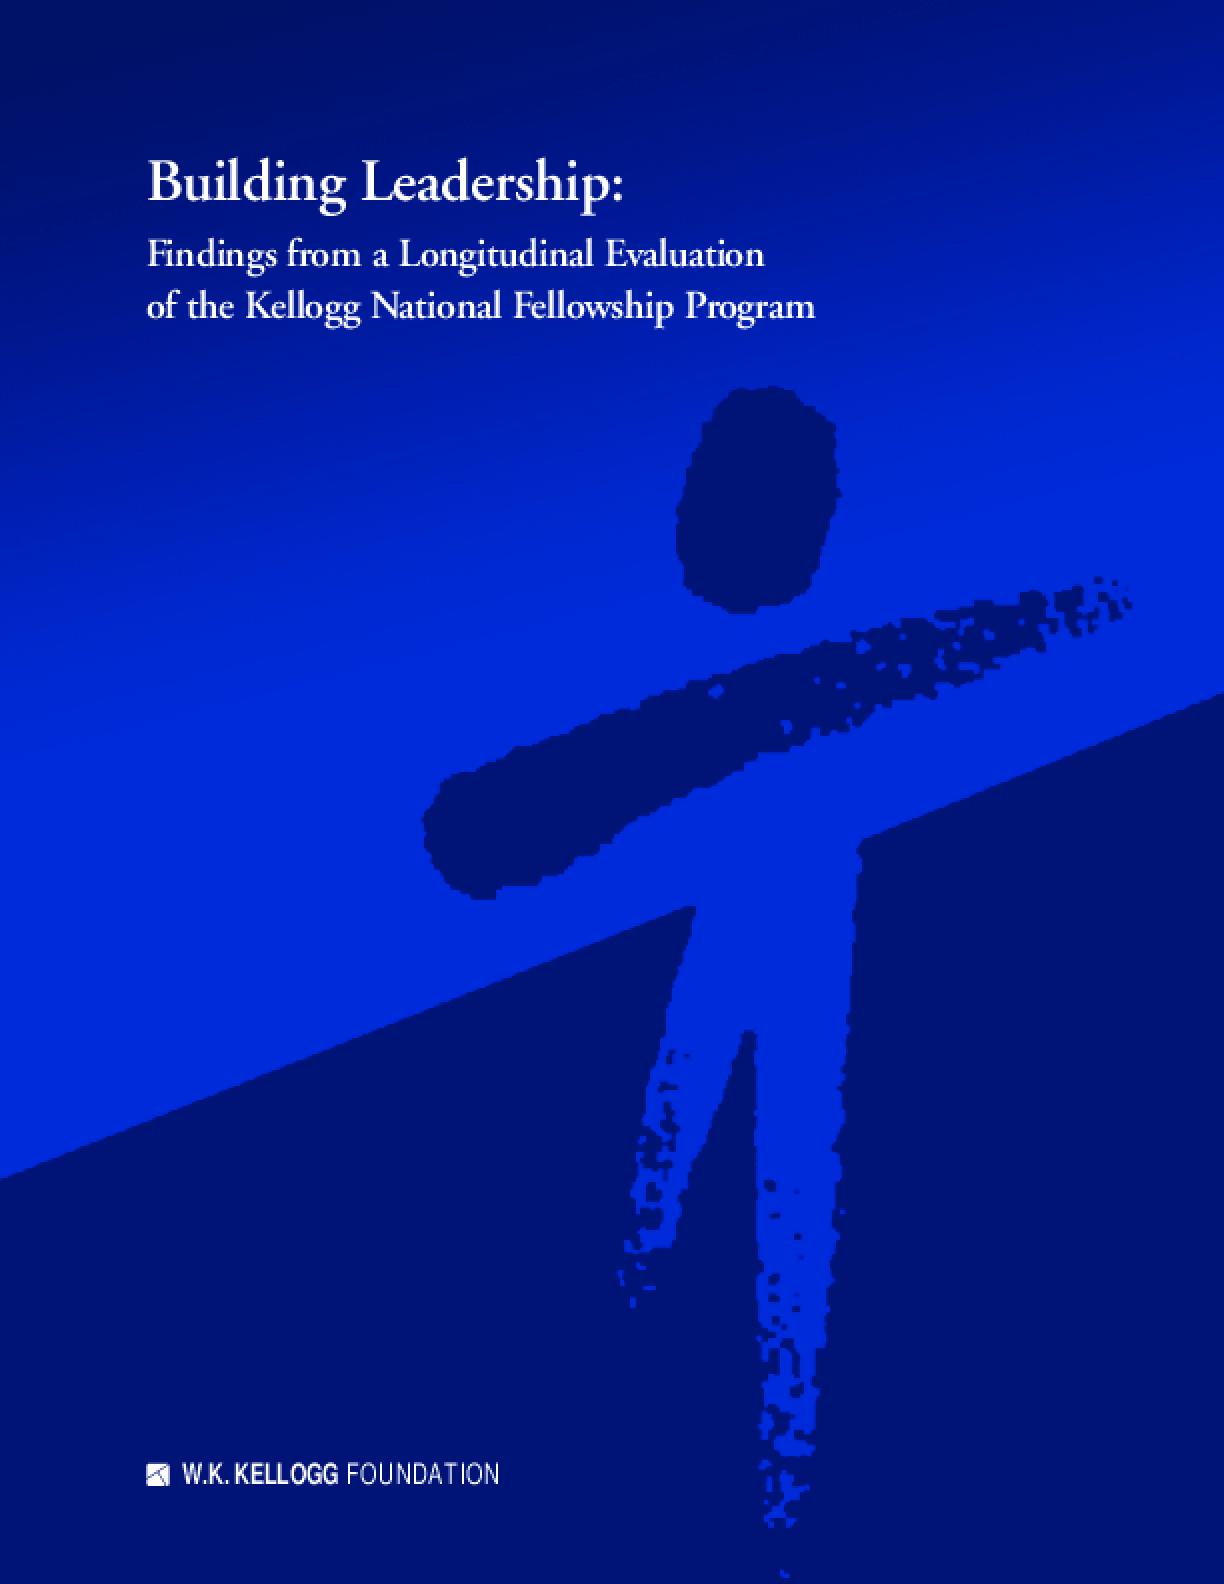 Building Leadership: Findings from a Longitudinal Evaluation of the Kellogg National Fellowship Program (Full Report)